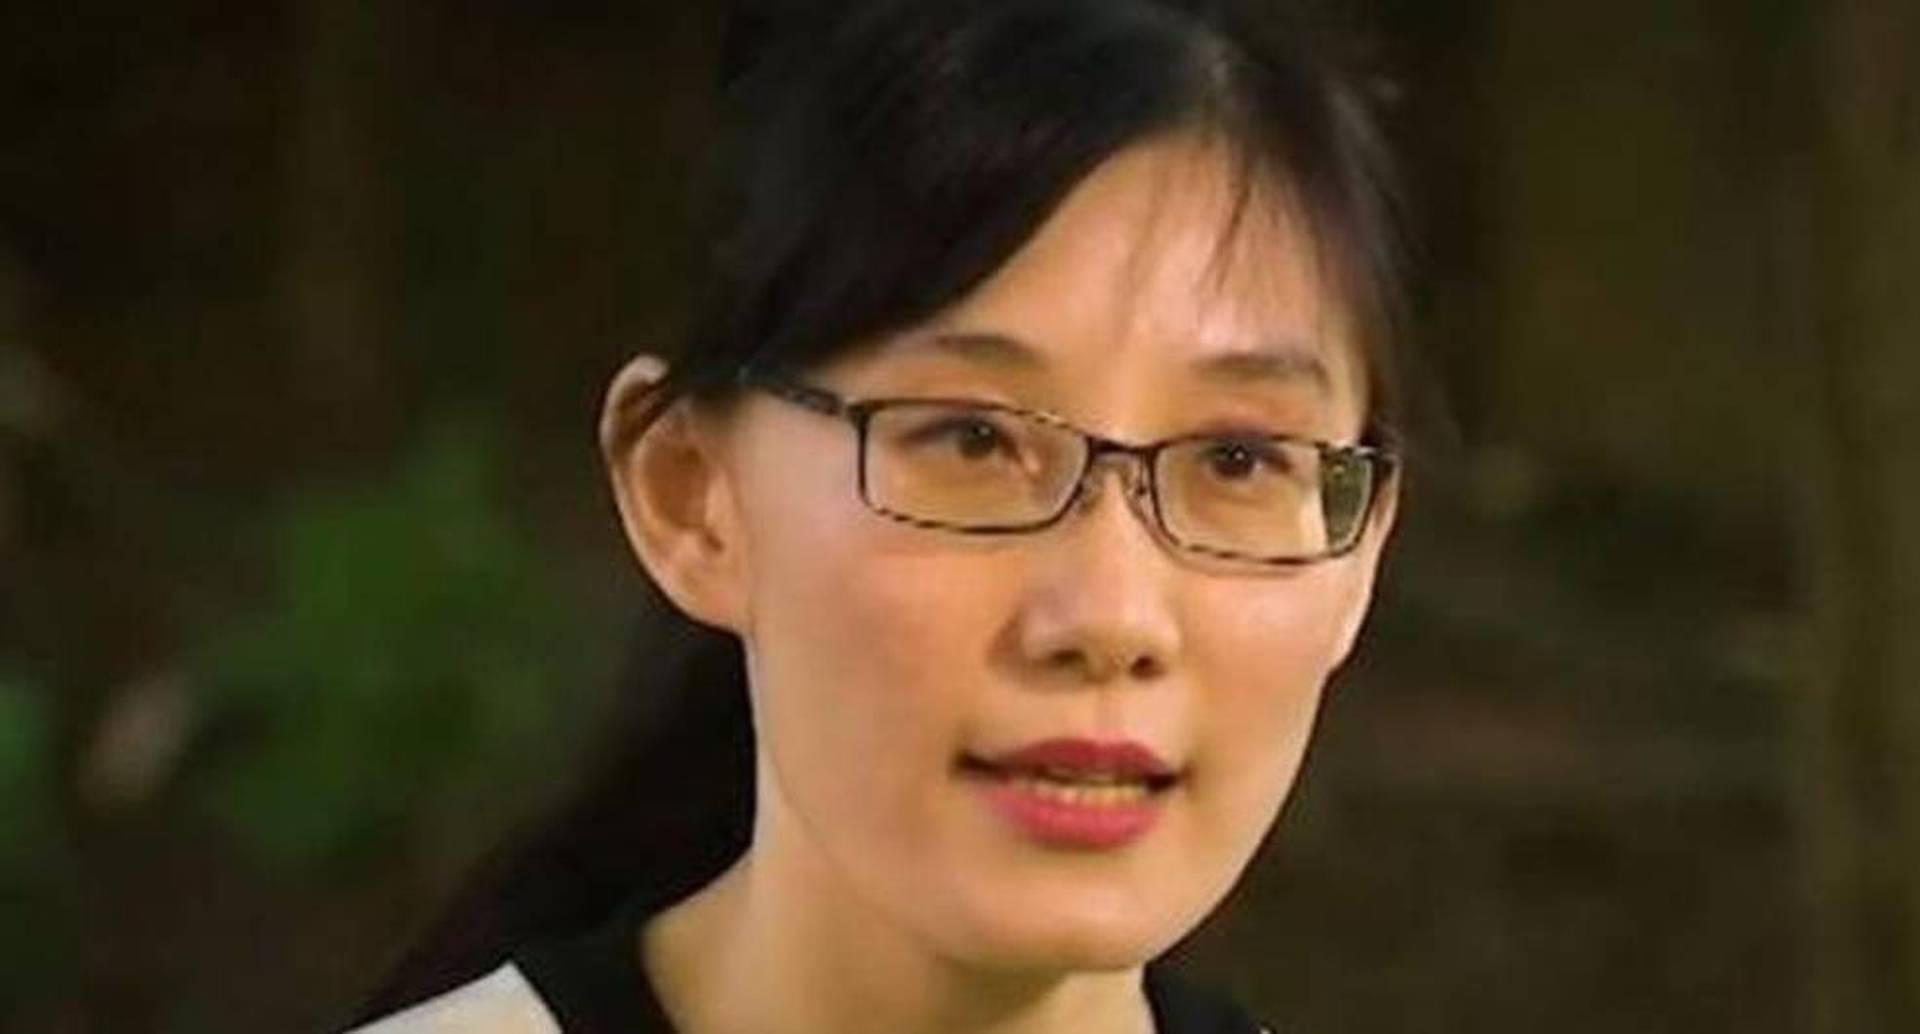 Li-Meng Yan, la viróloga que dice tener la verdad sobre el coronavirus Foto: Captura de video, entrevista Fox News